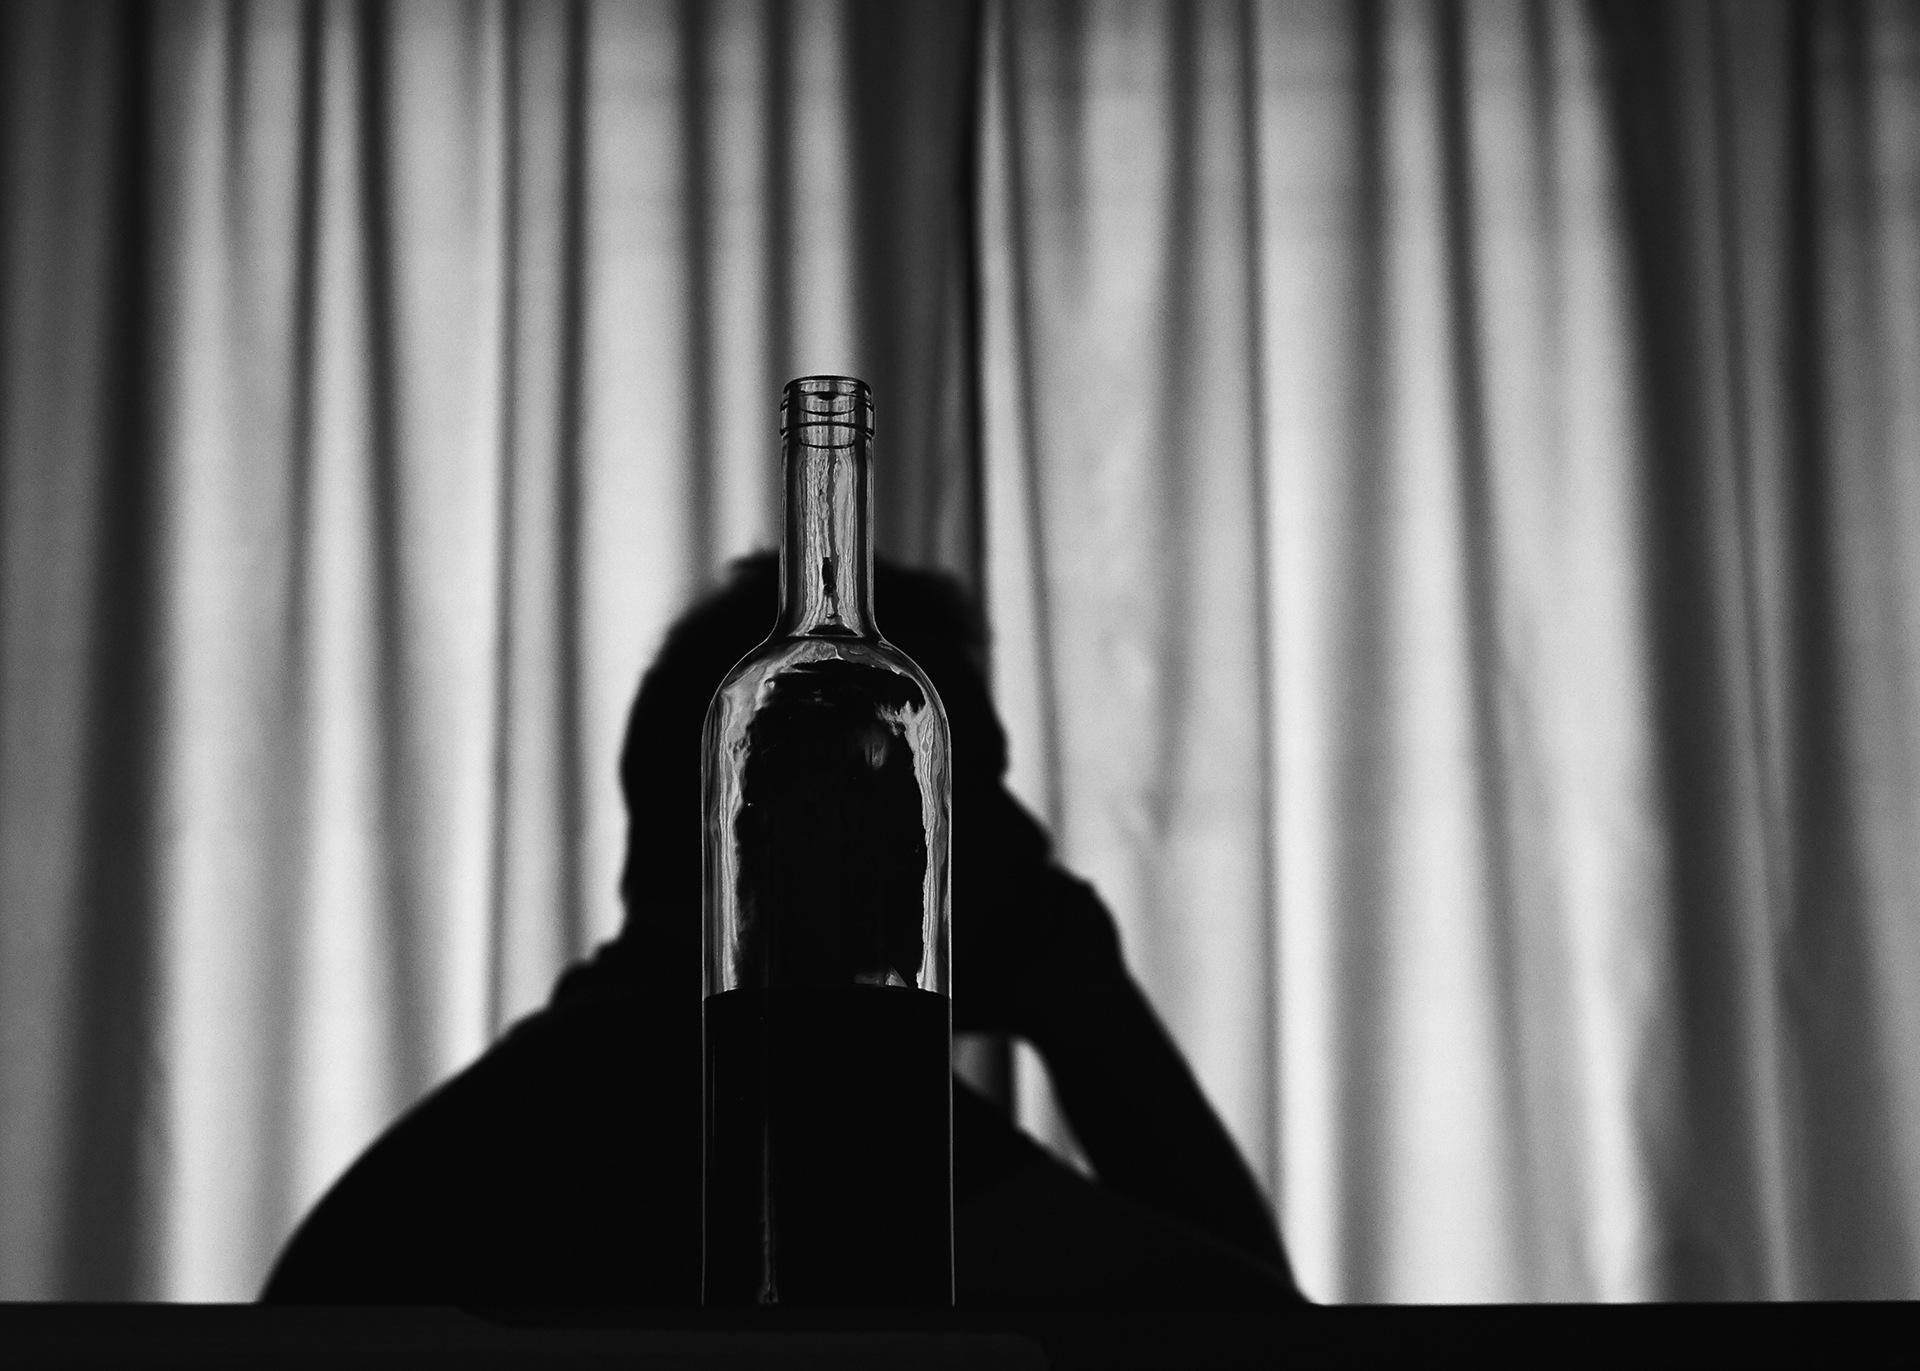 Man in a bottle by White Raven